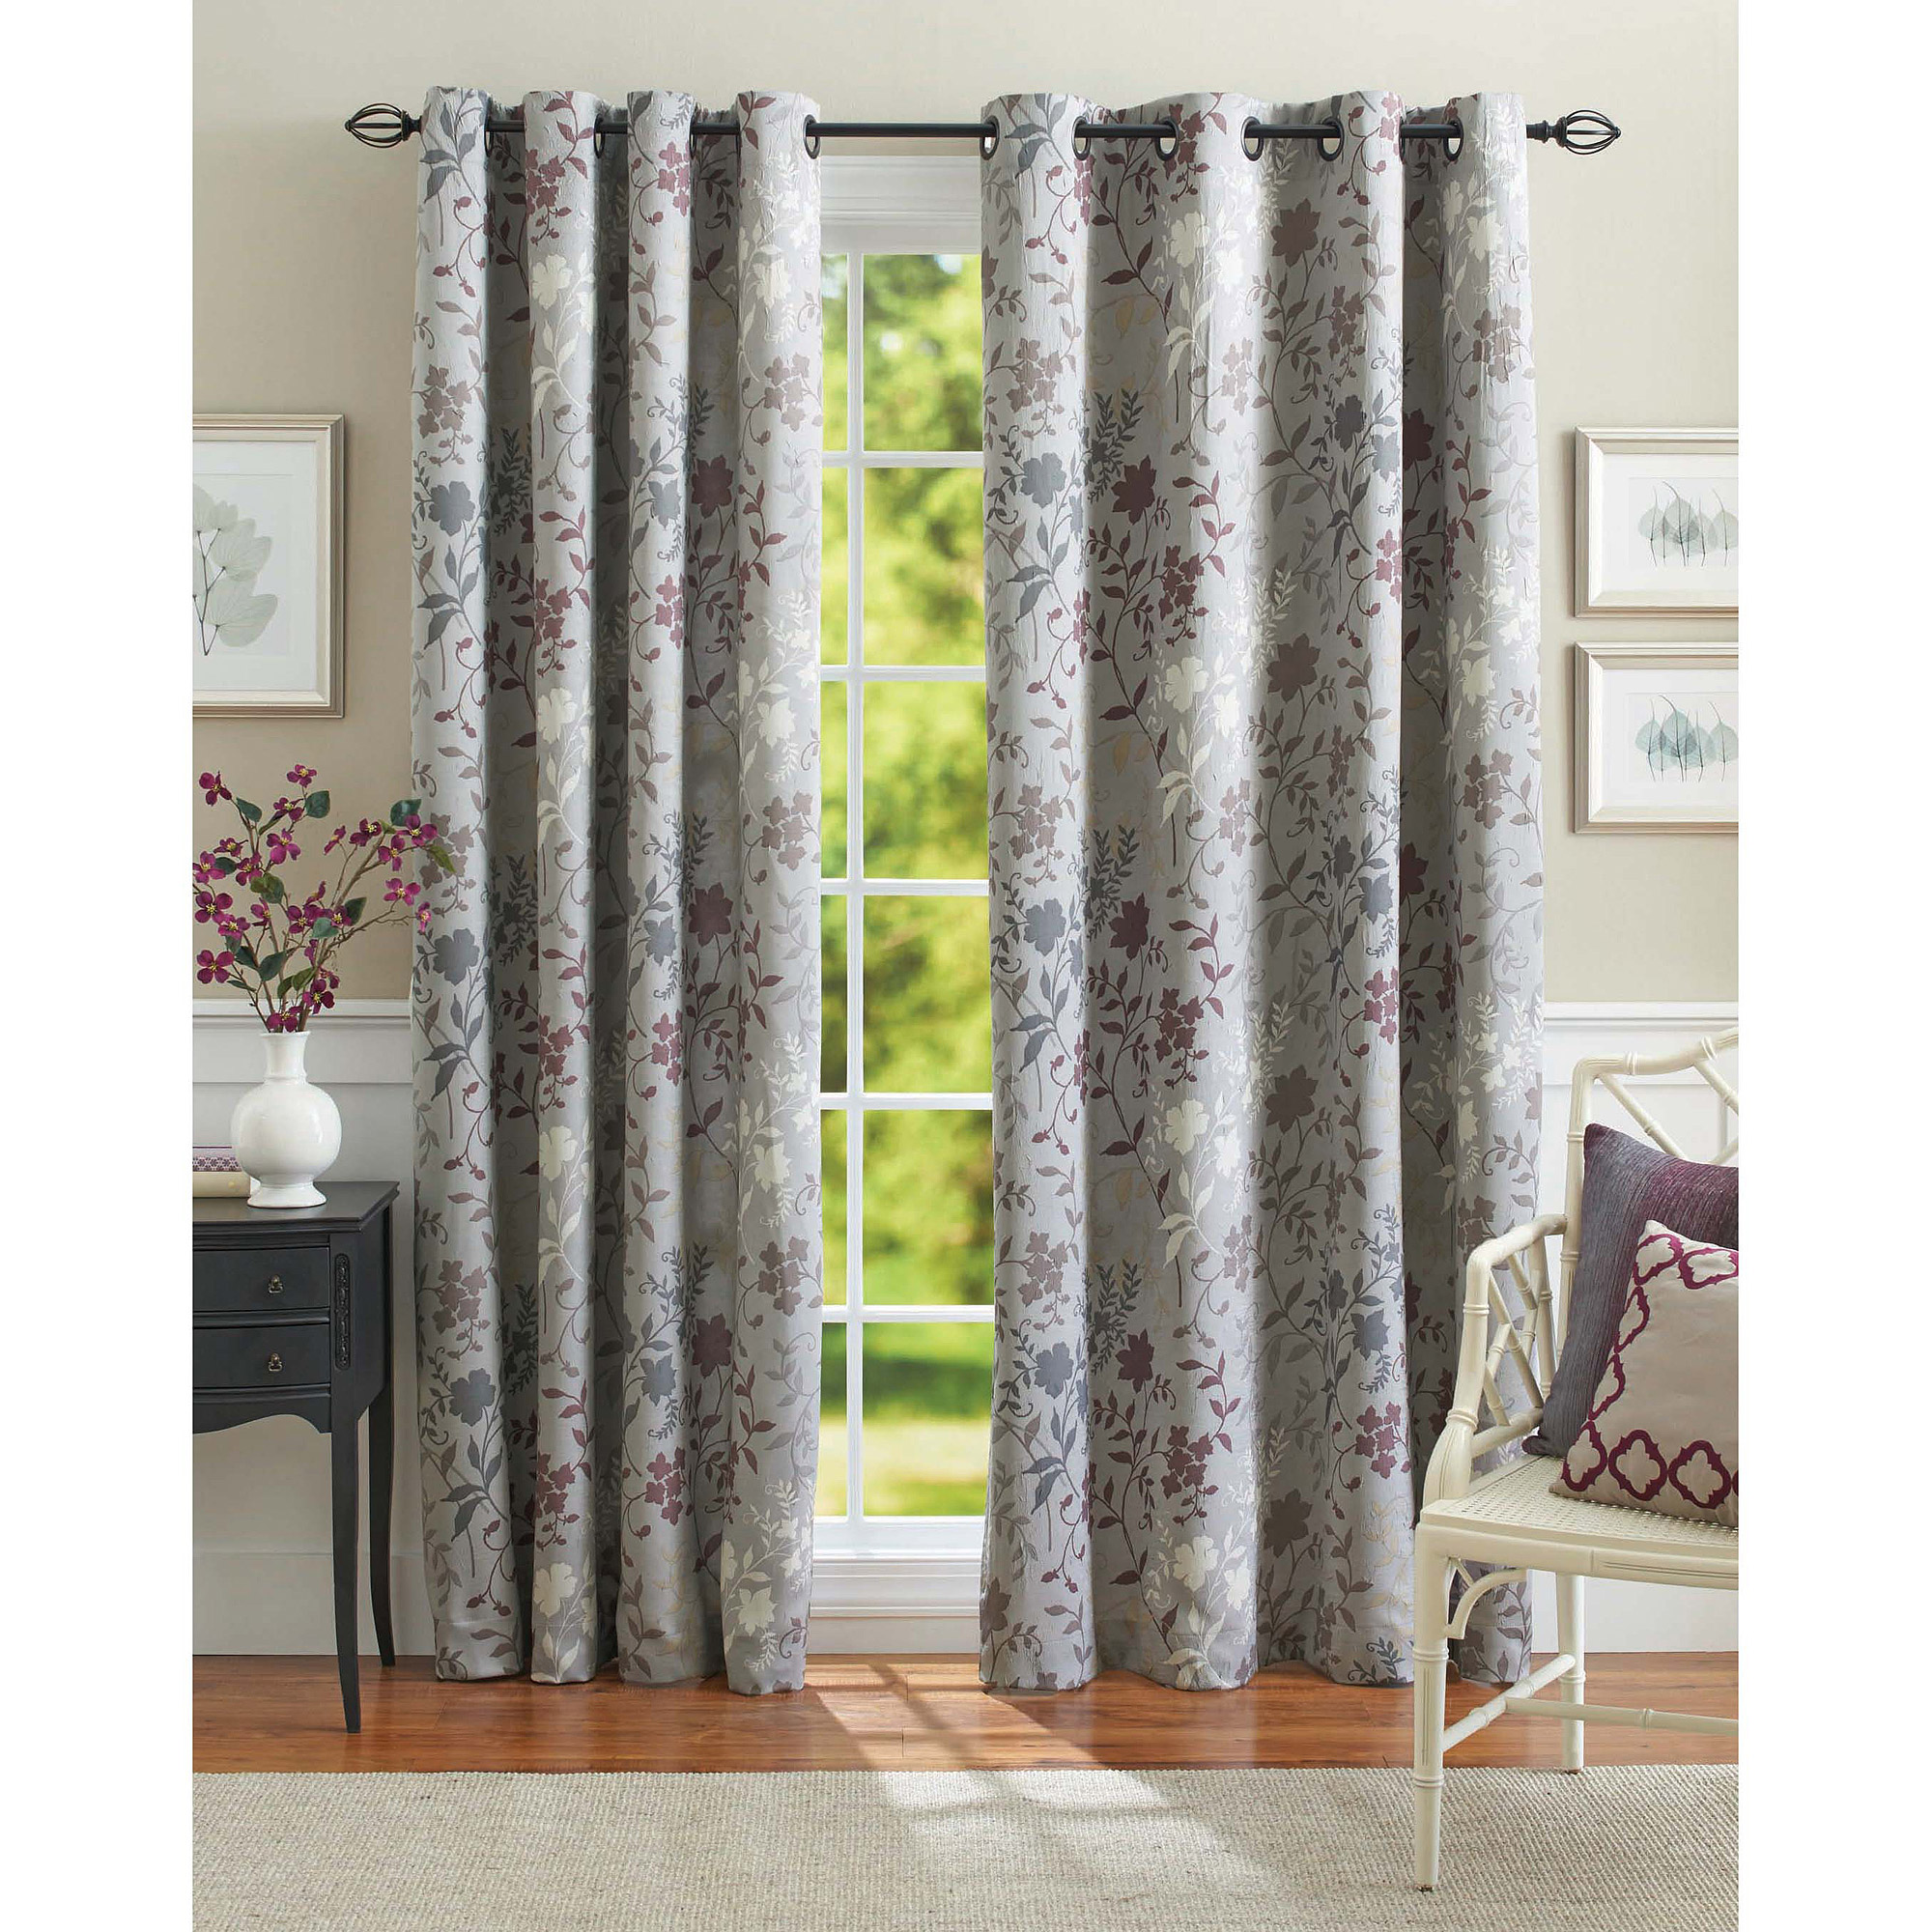 Better Homes and Gardens Calista Print Room Darkening Curtain Panel